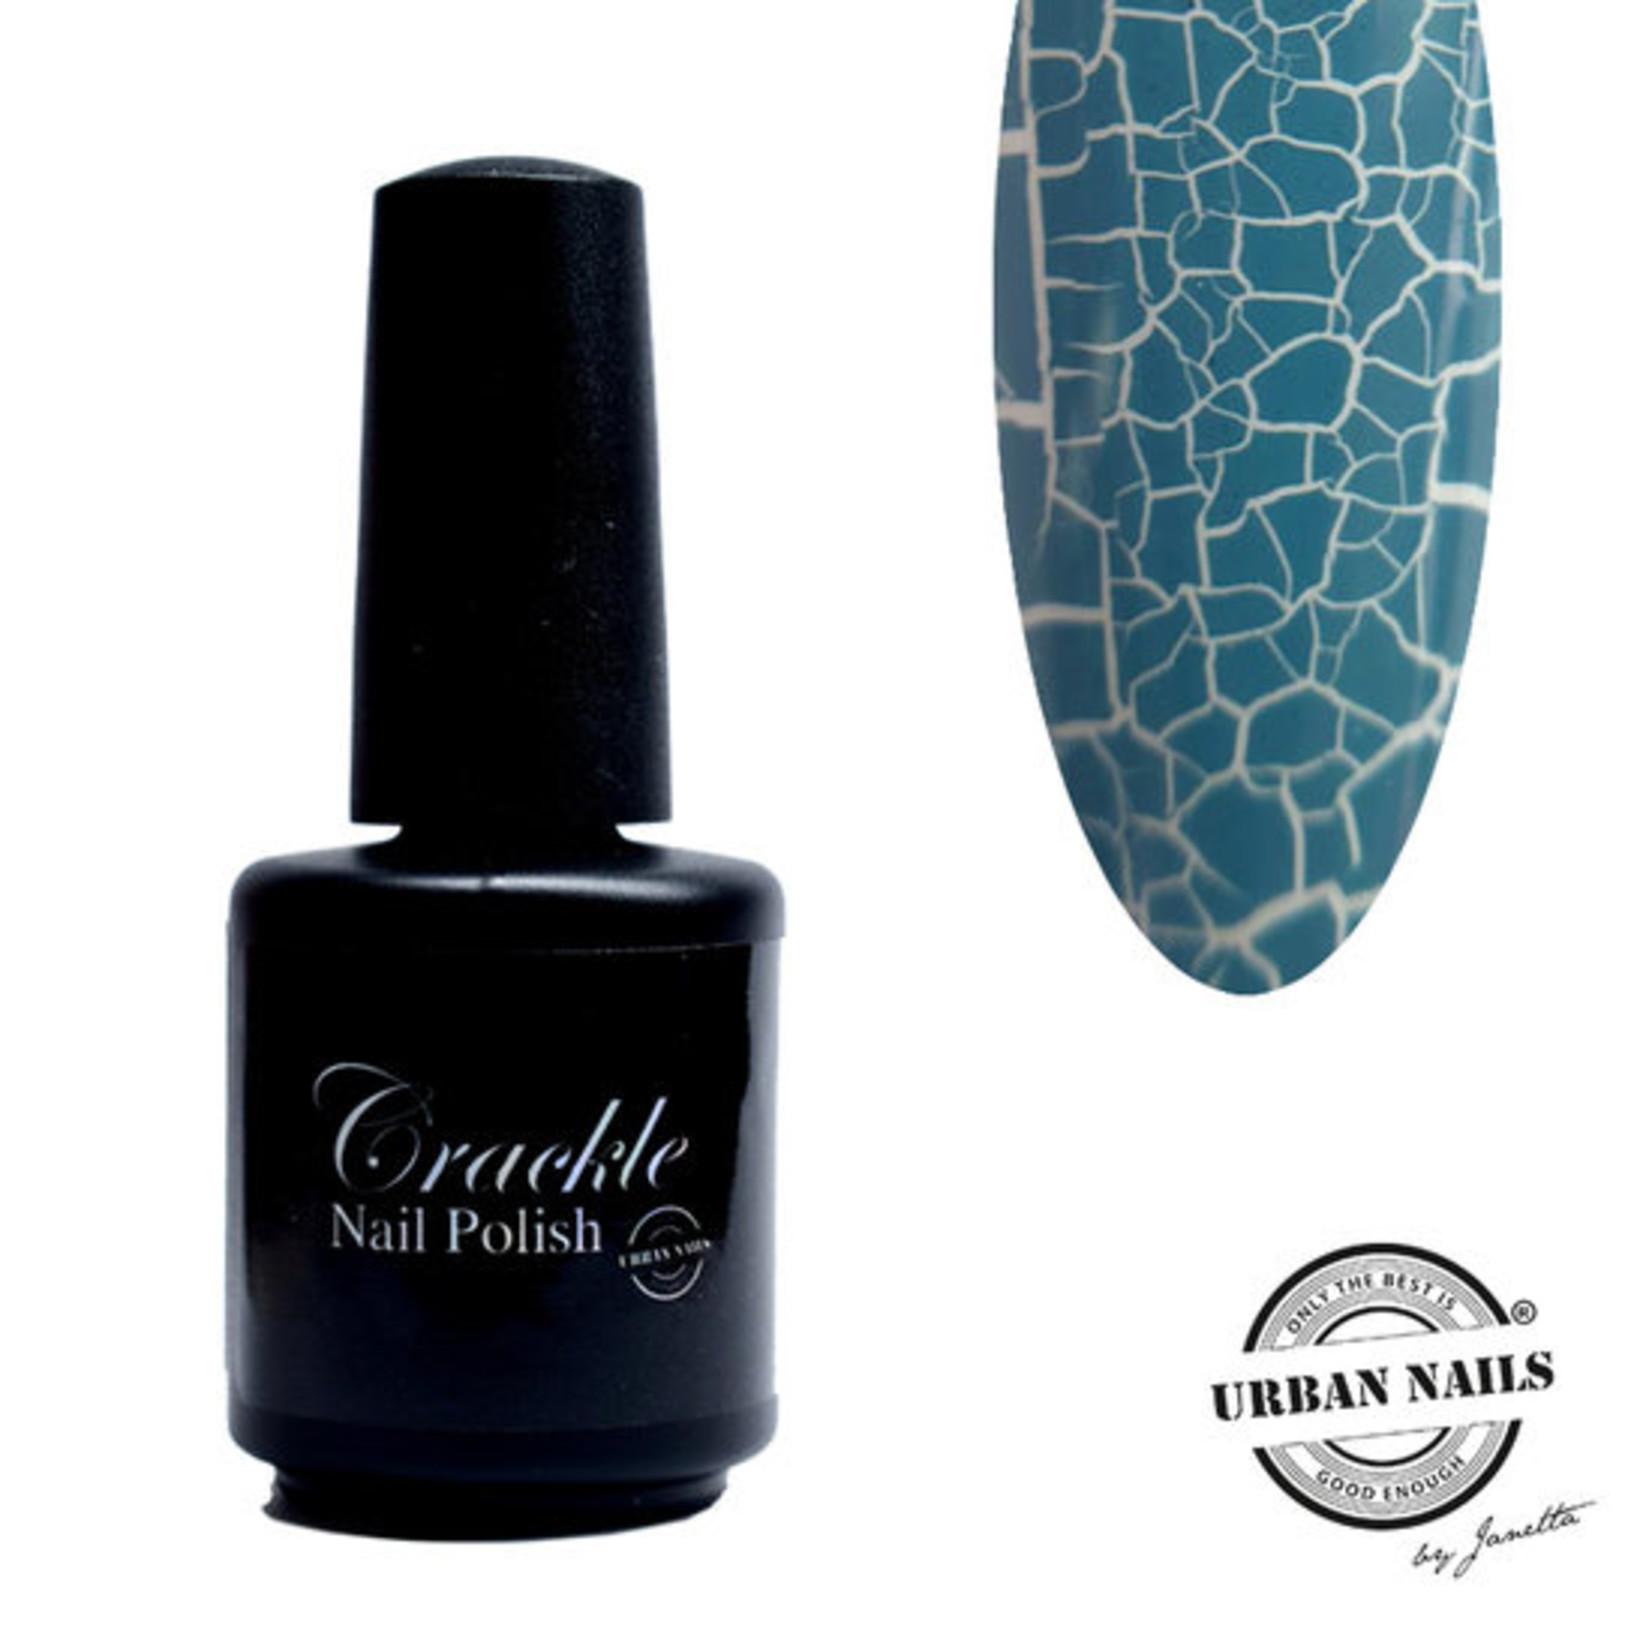 Urban Nails Crackle Nail Polish 8 Grijs Blauw